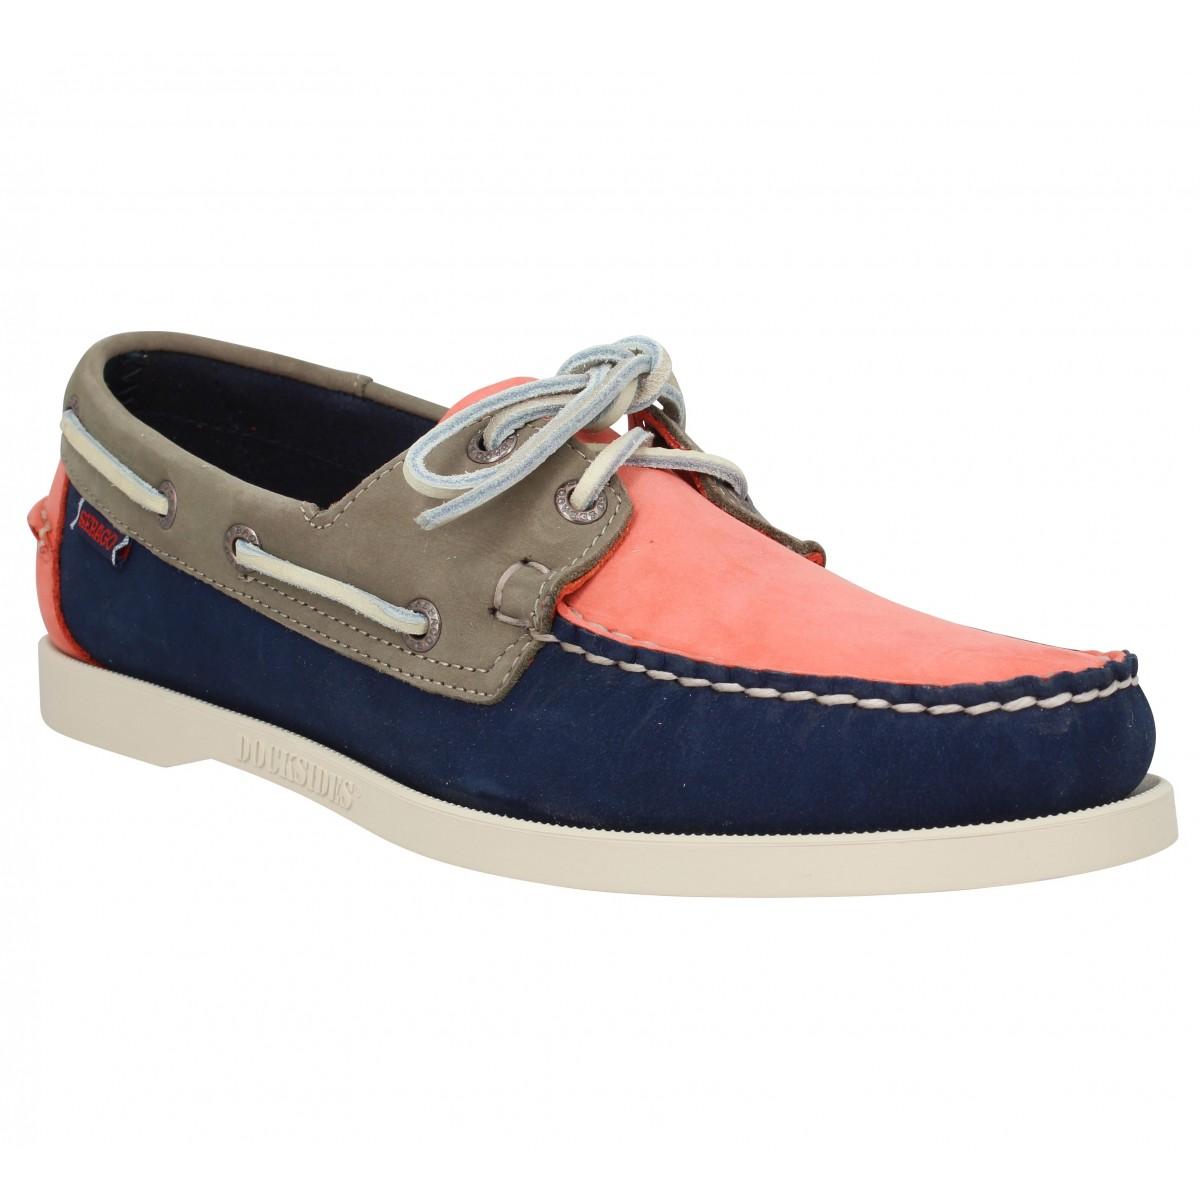 Chaussures bateaux SEBAGO Docksides Spinnaker velours Homme Navy Coral